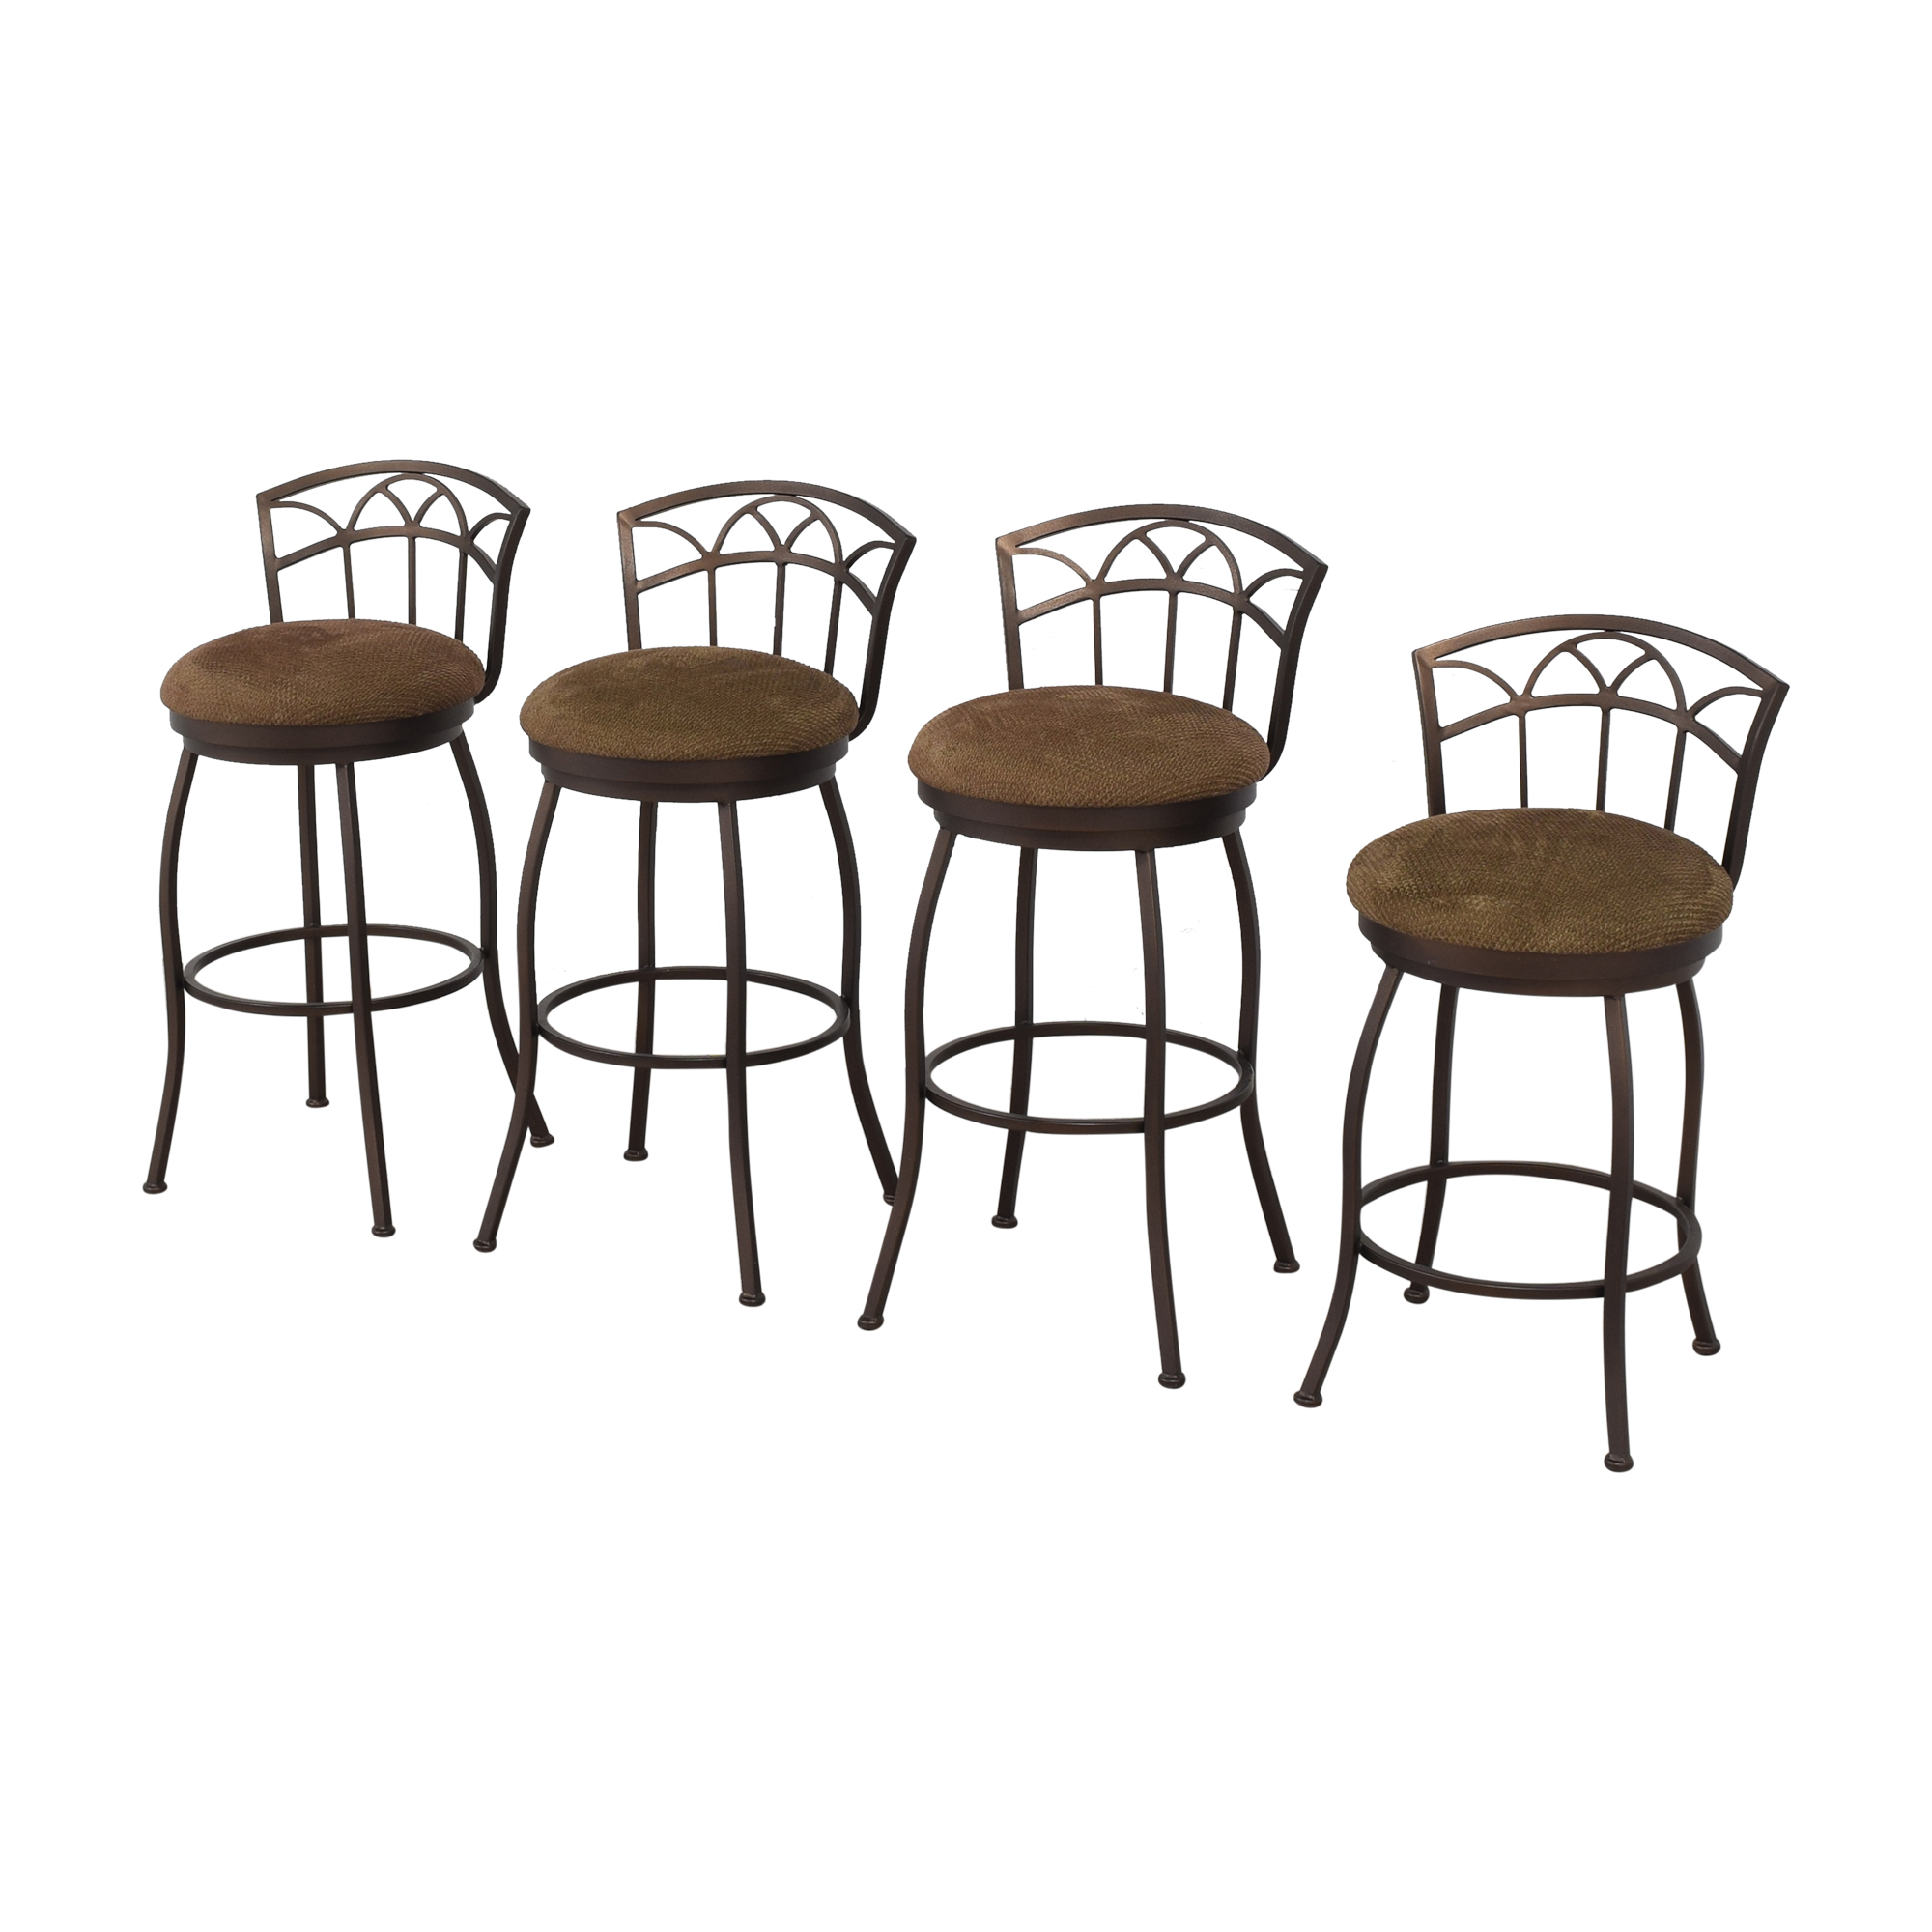 Tempo Furniture Tempo Frolic Bar Stools discount